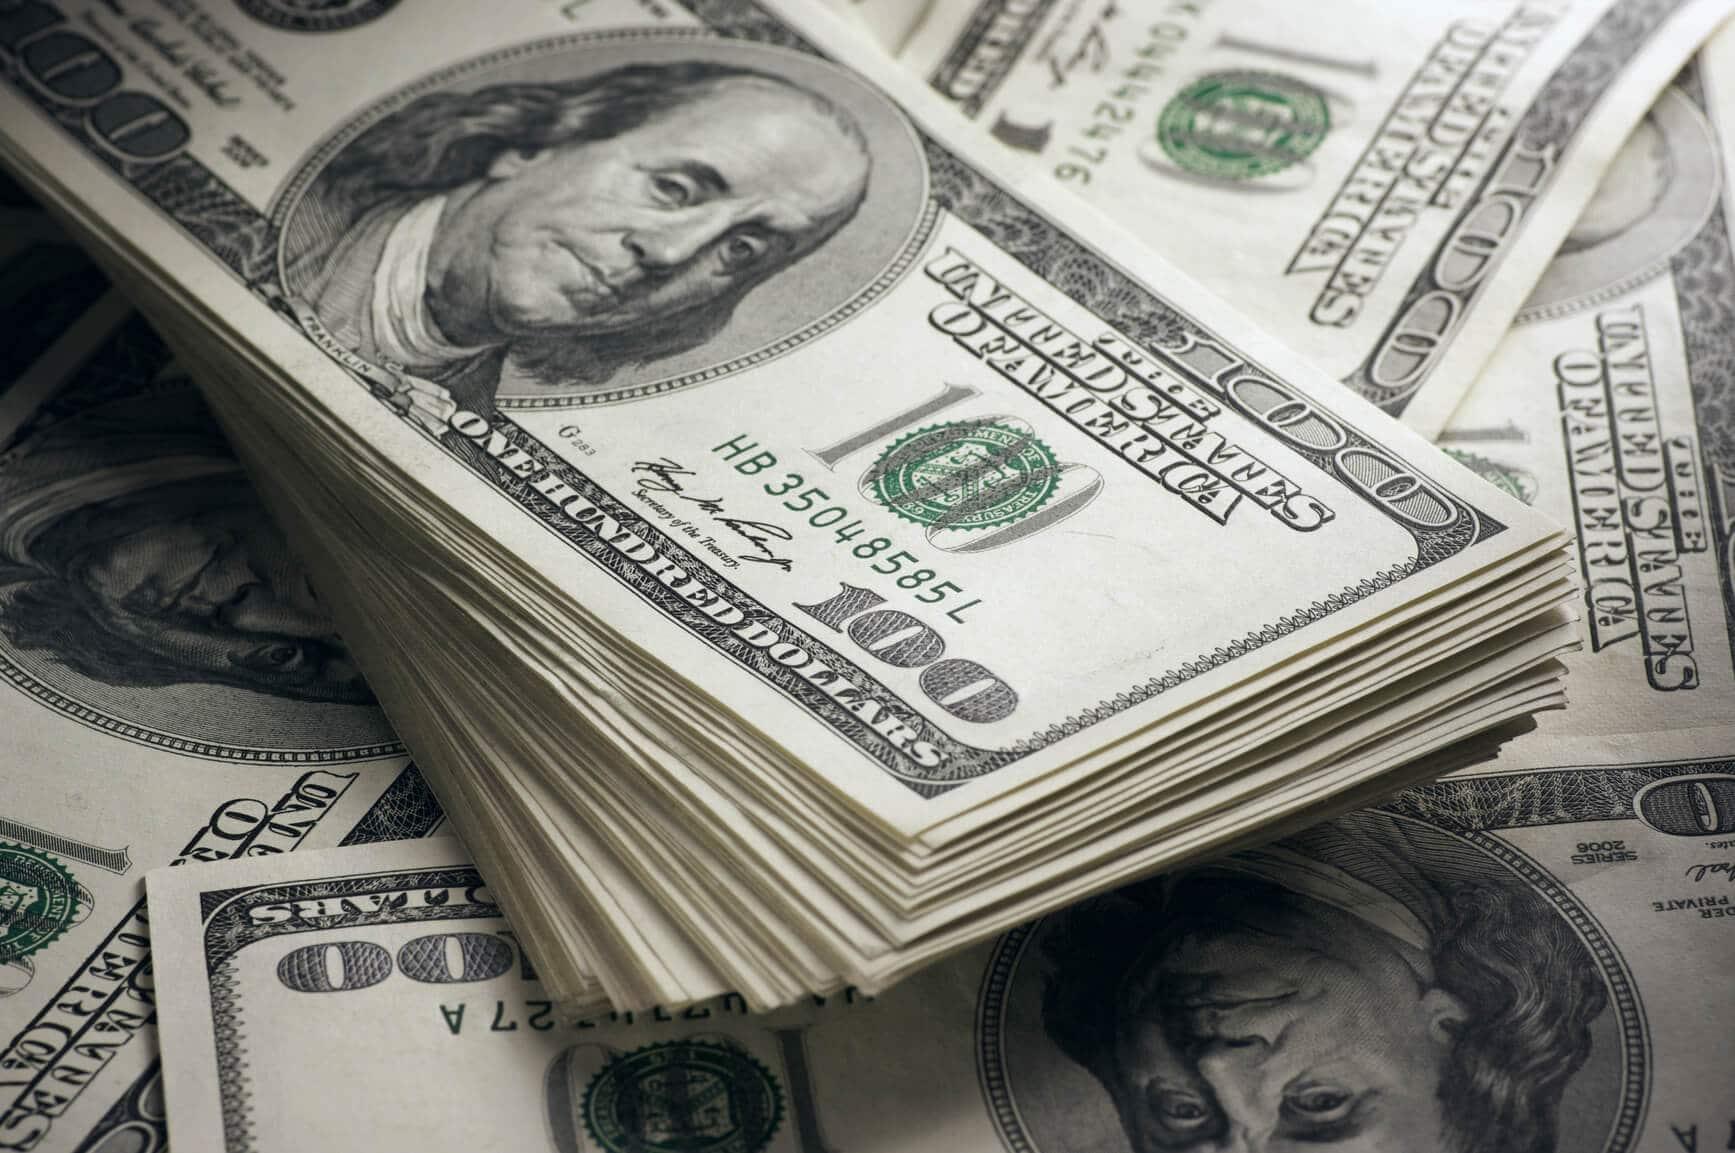 Alimony Payments